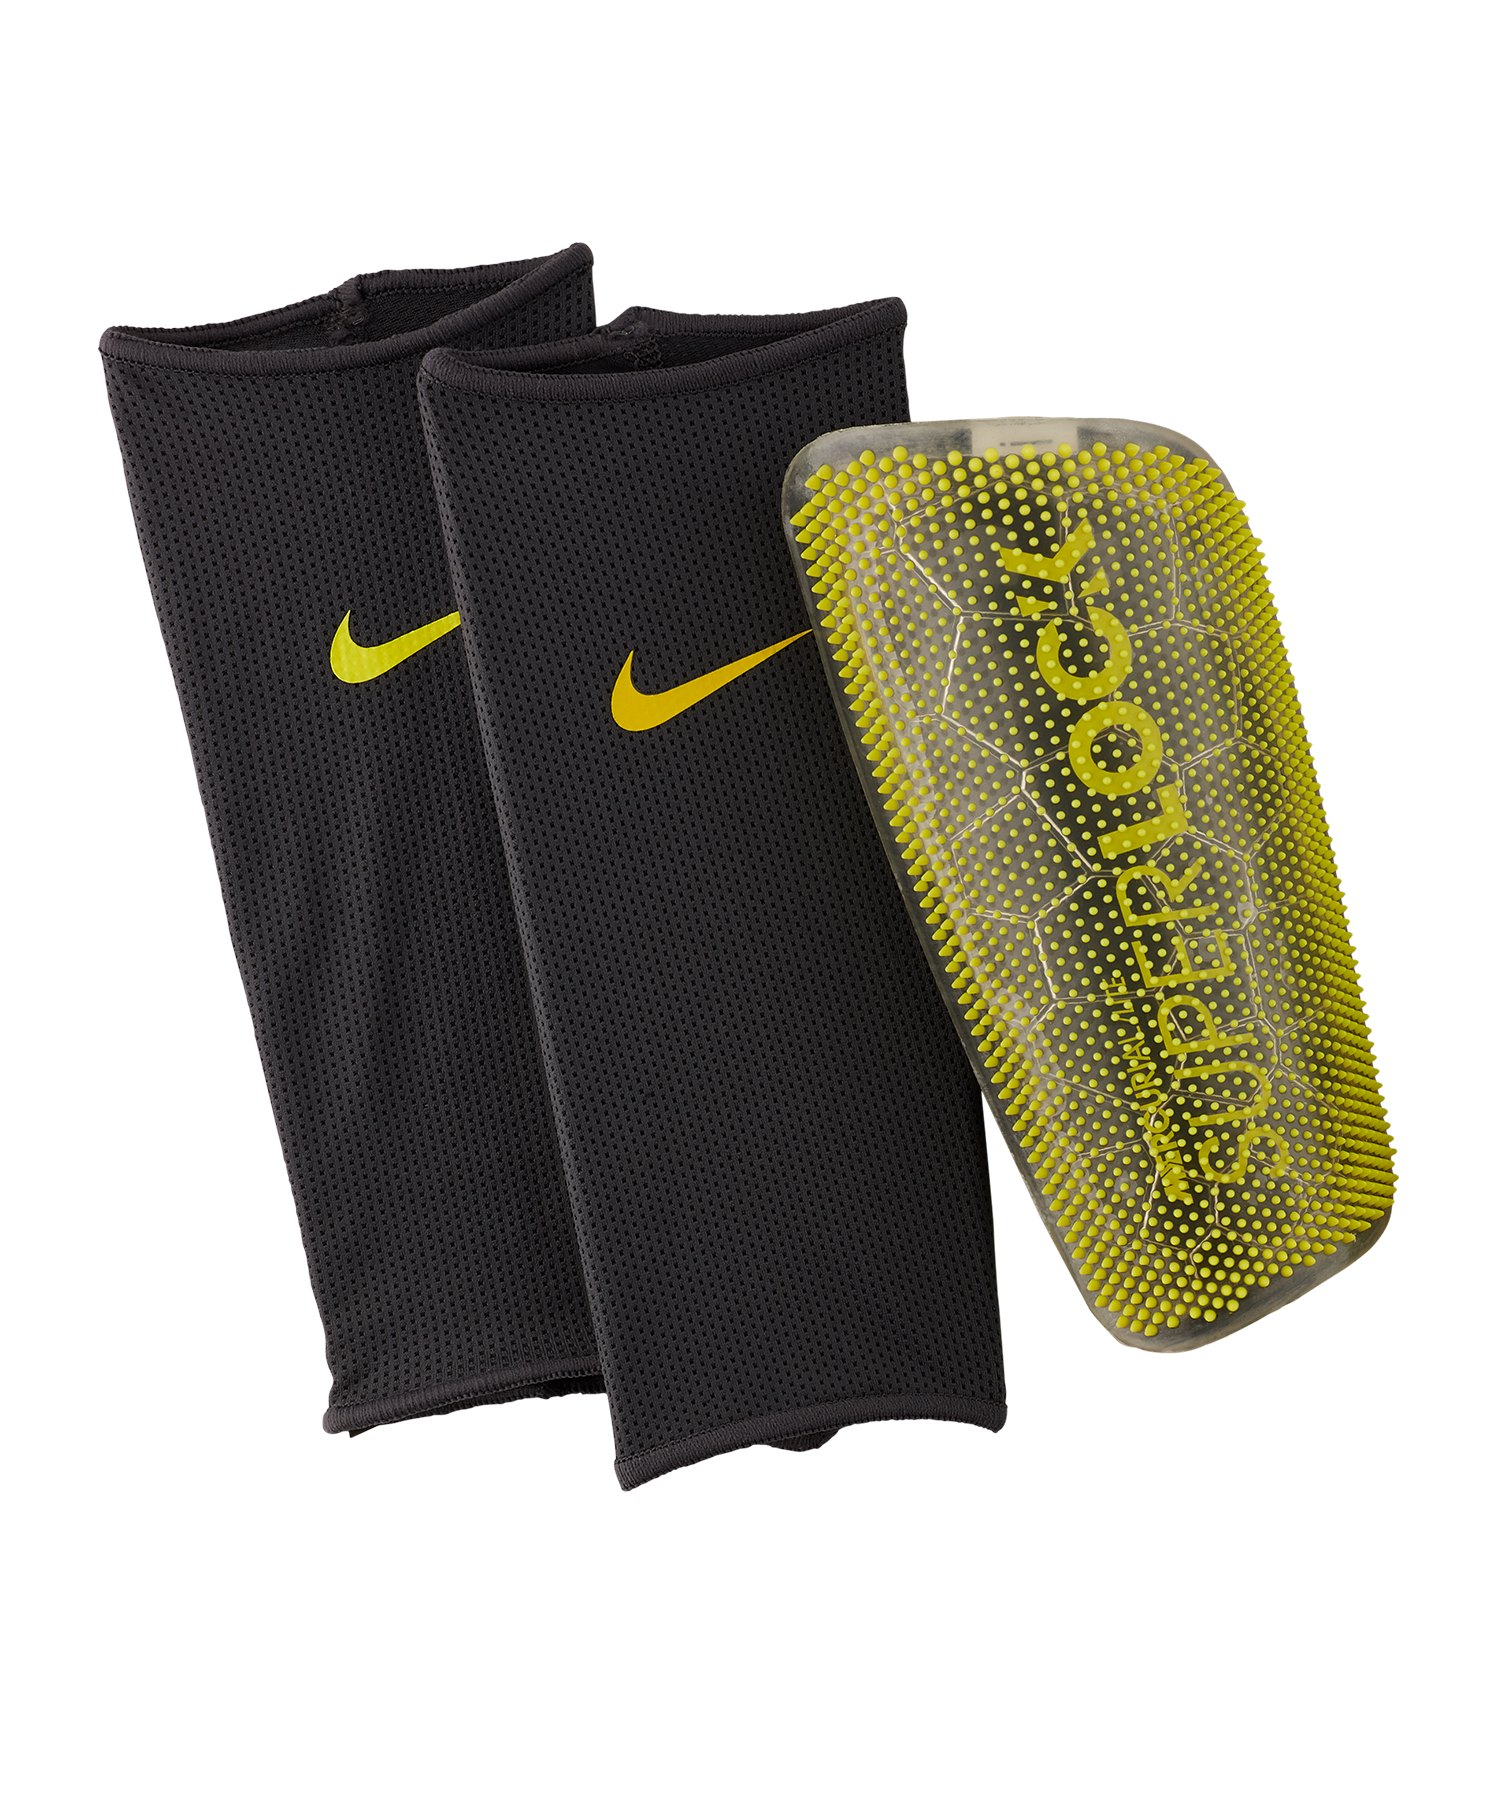 Nike Mercurial Lite Superlock Schoner Grau F060 - grau